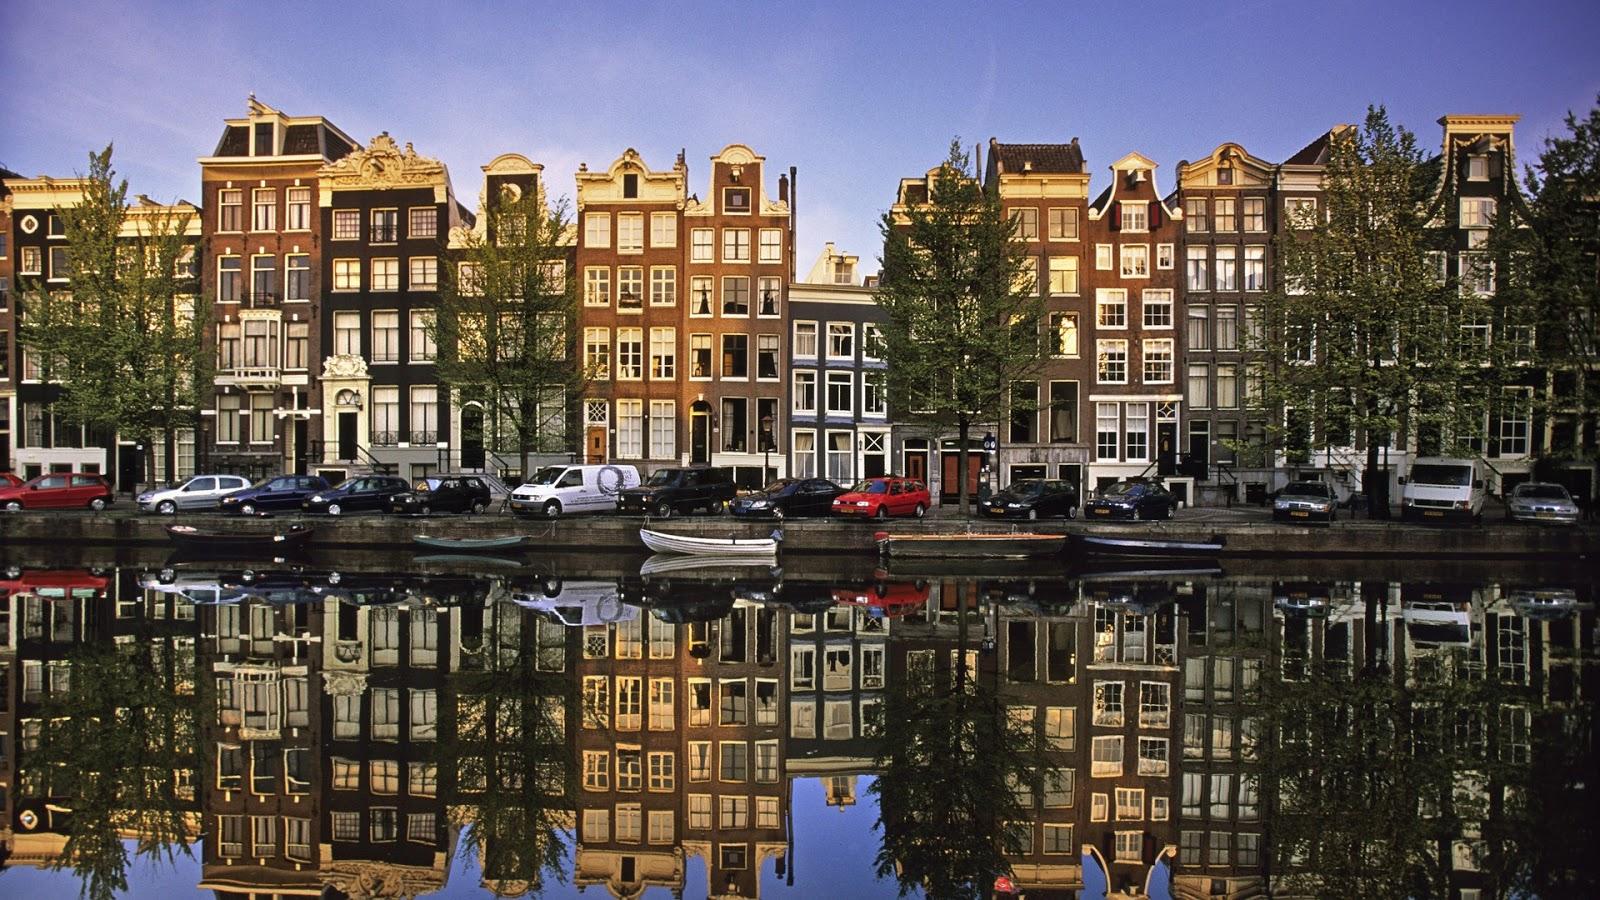 AMSTERDAM, CIDADE HOLANDESA